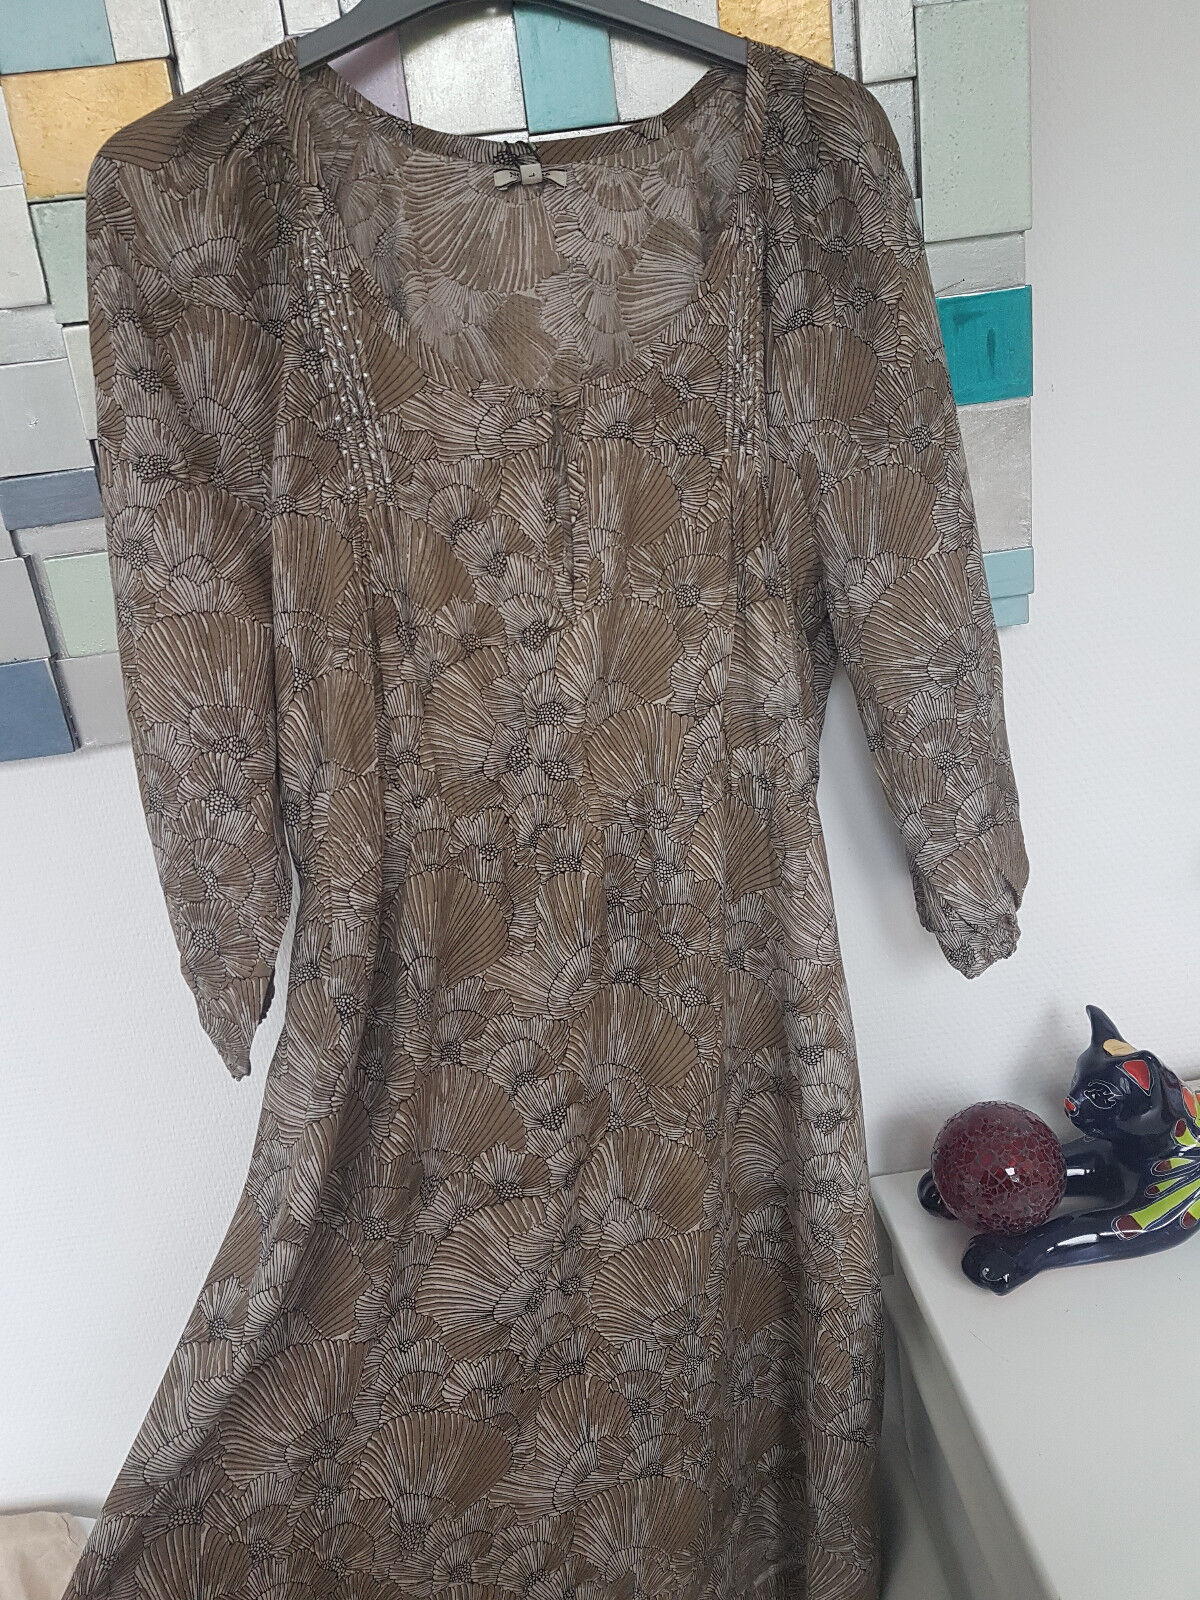 NOA NOA bezauberndes Kleid Beige hellbraun mit tollen Schnitt neu Gr L M    G118